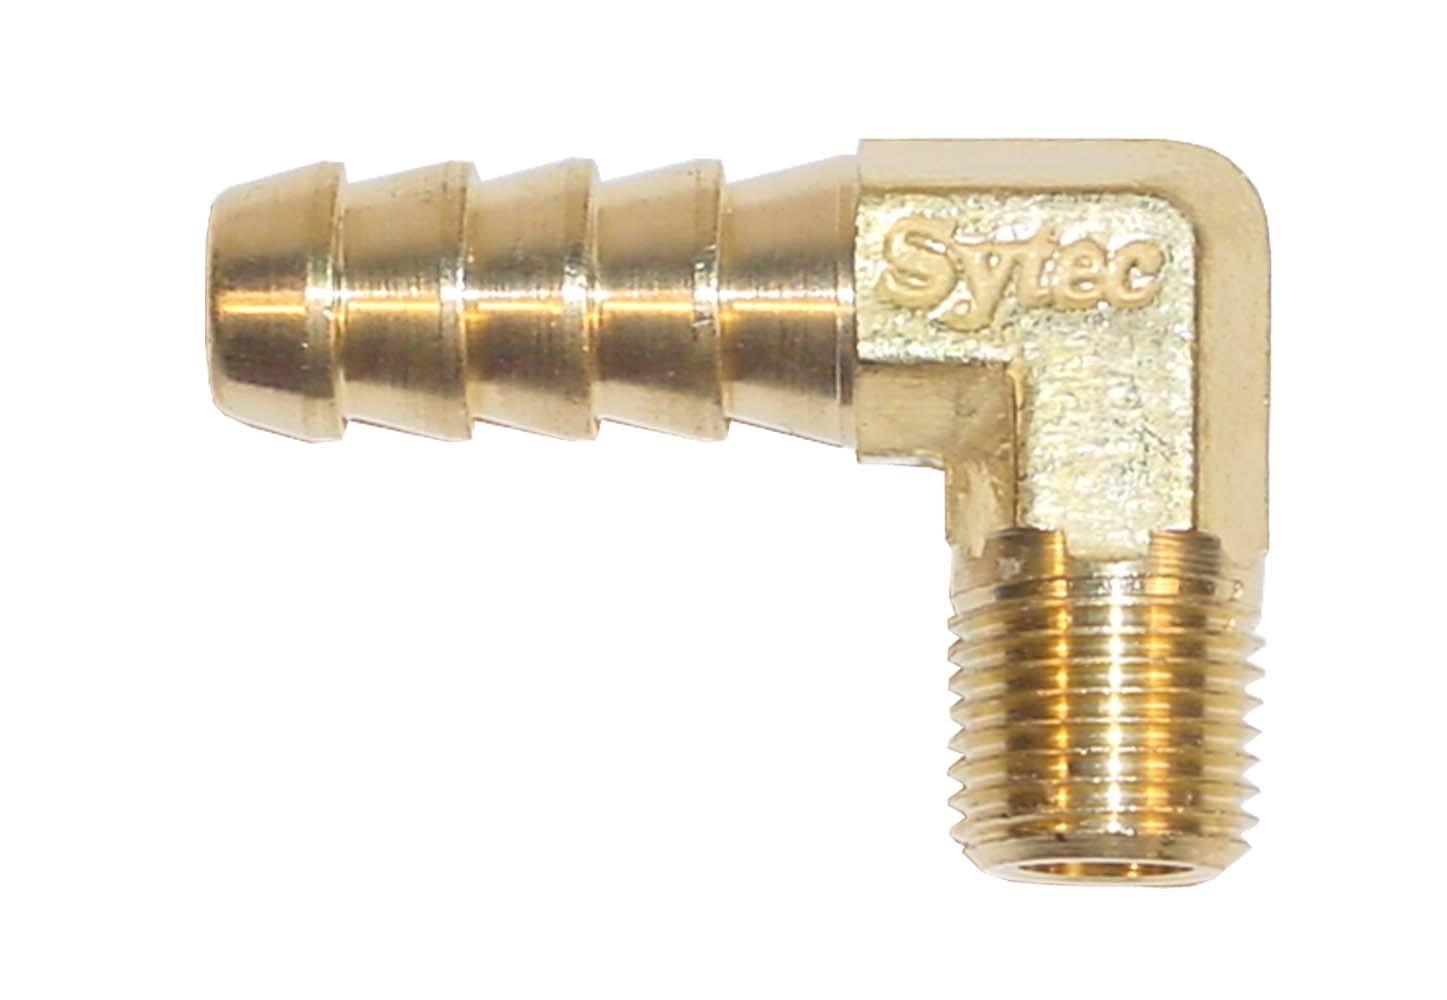 Fuel Pump 90 Degree Unions